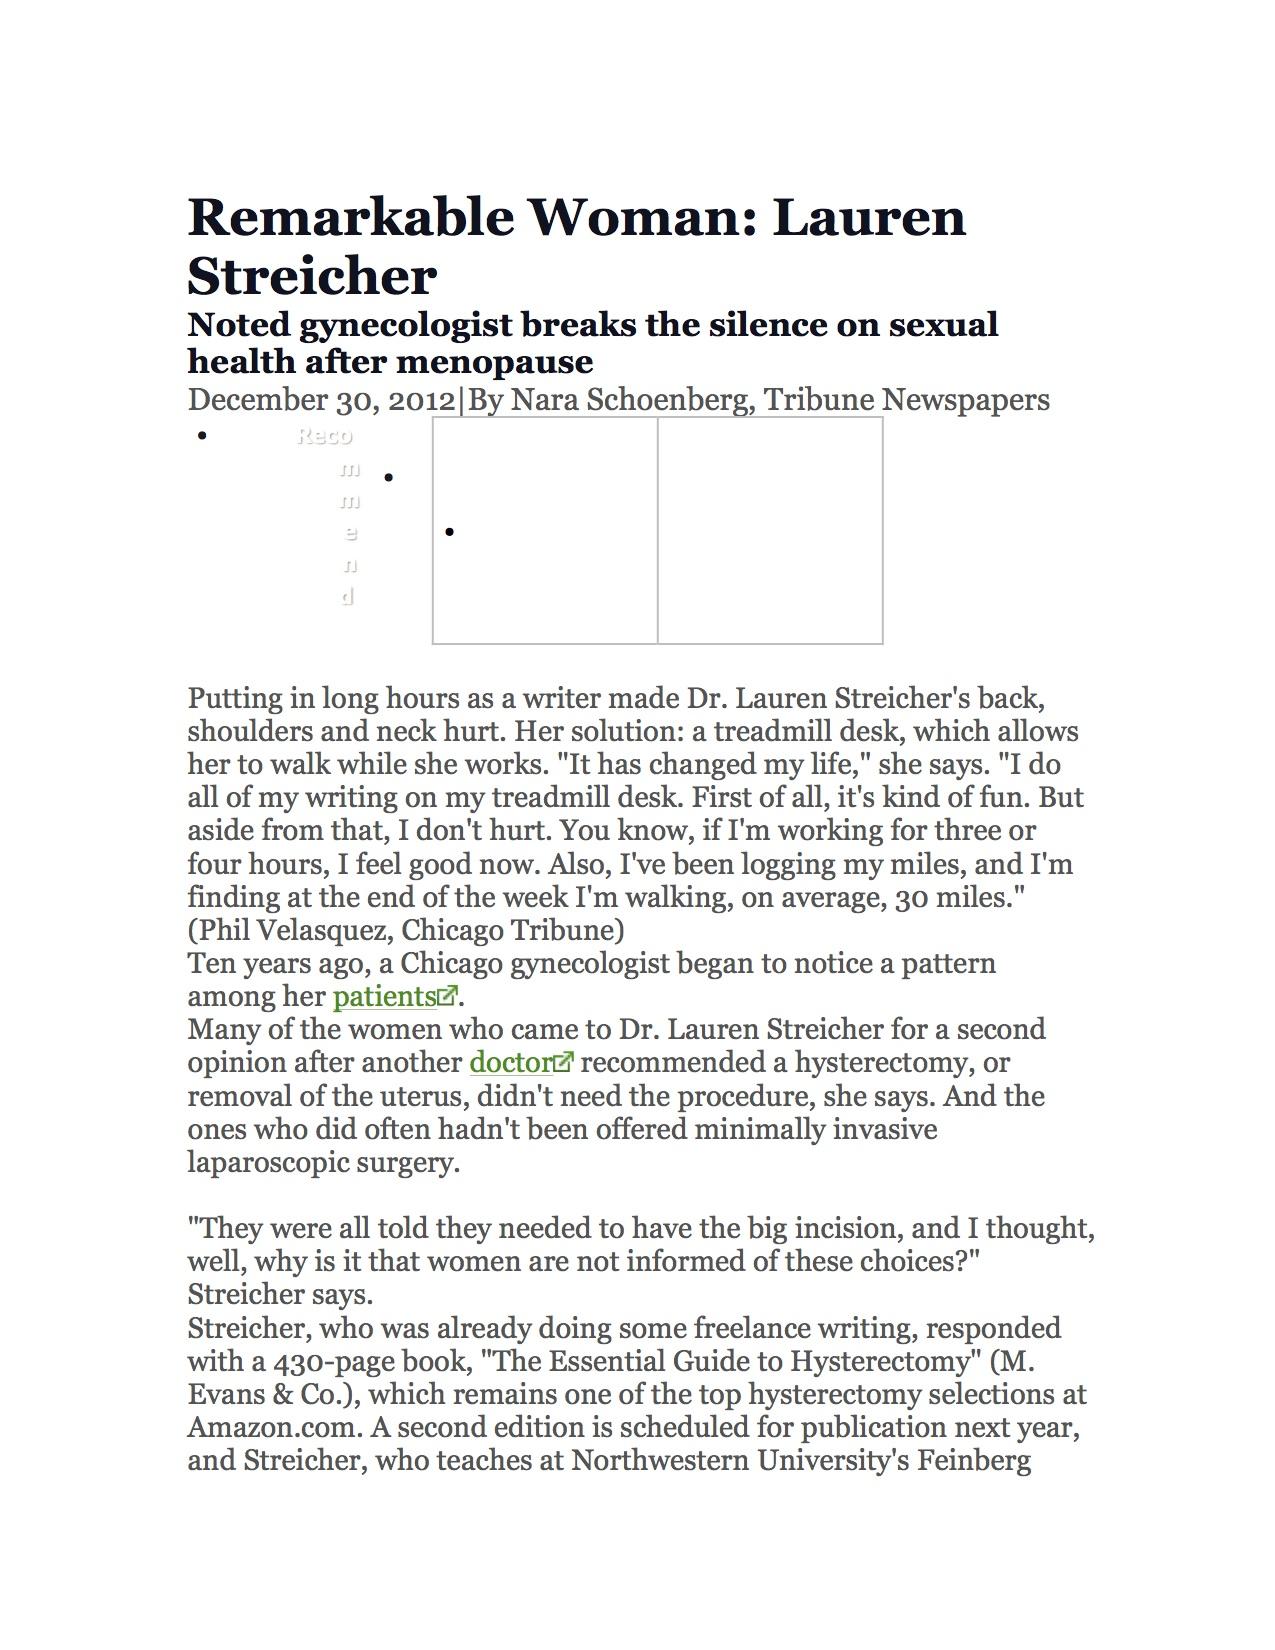 Microsoft Word - Remarkable Woman.jpg